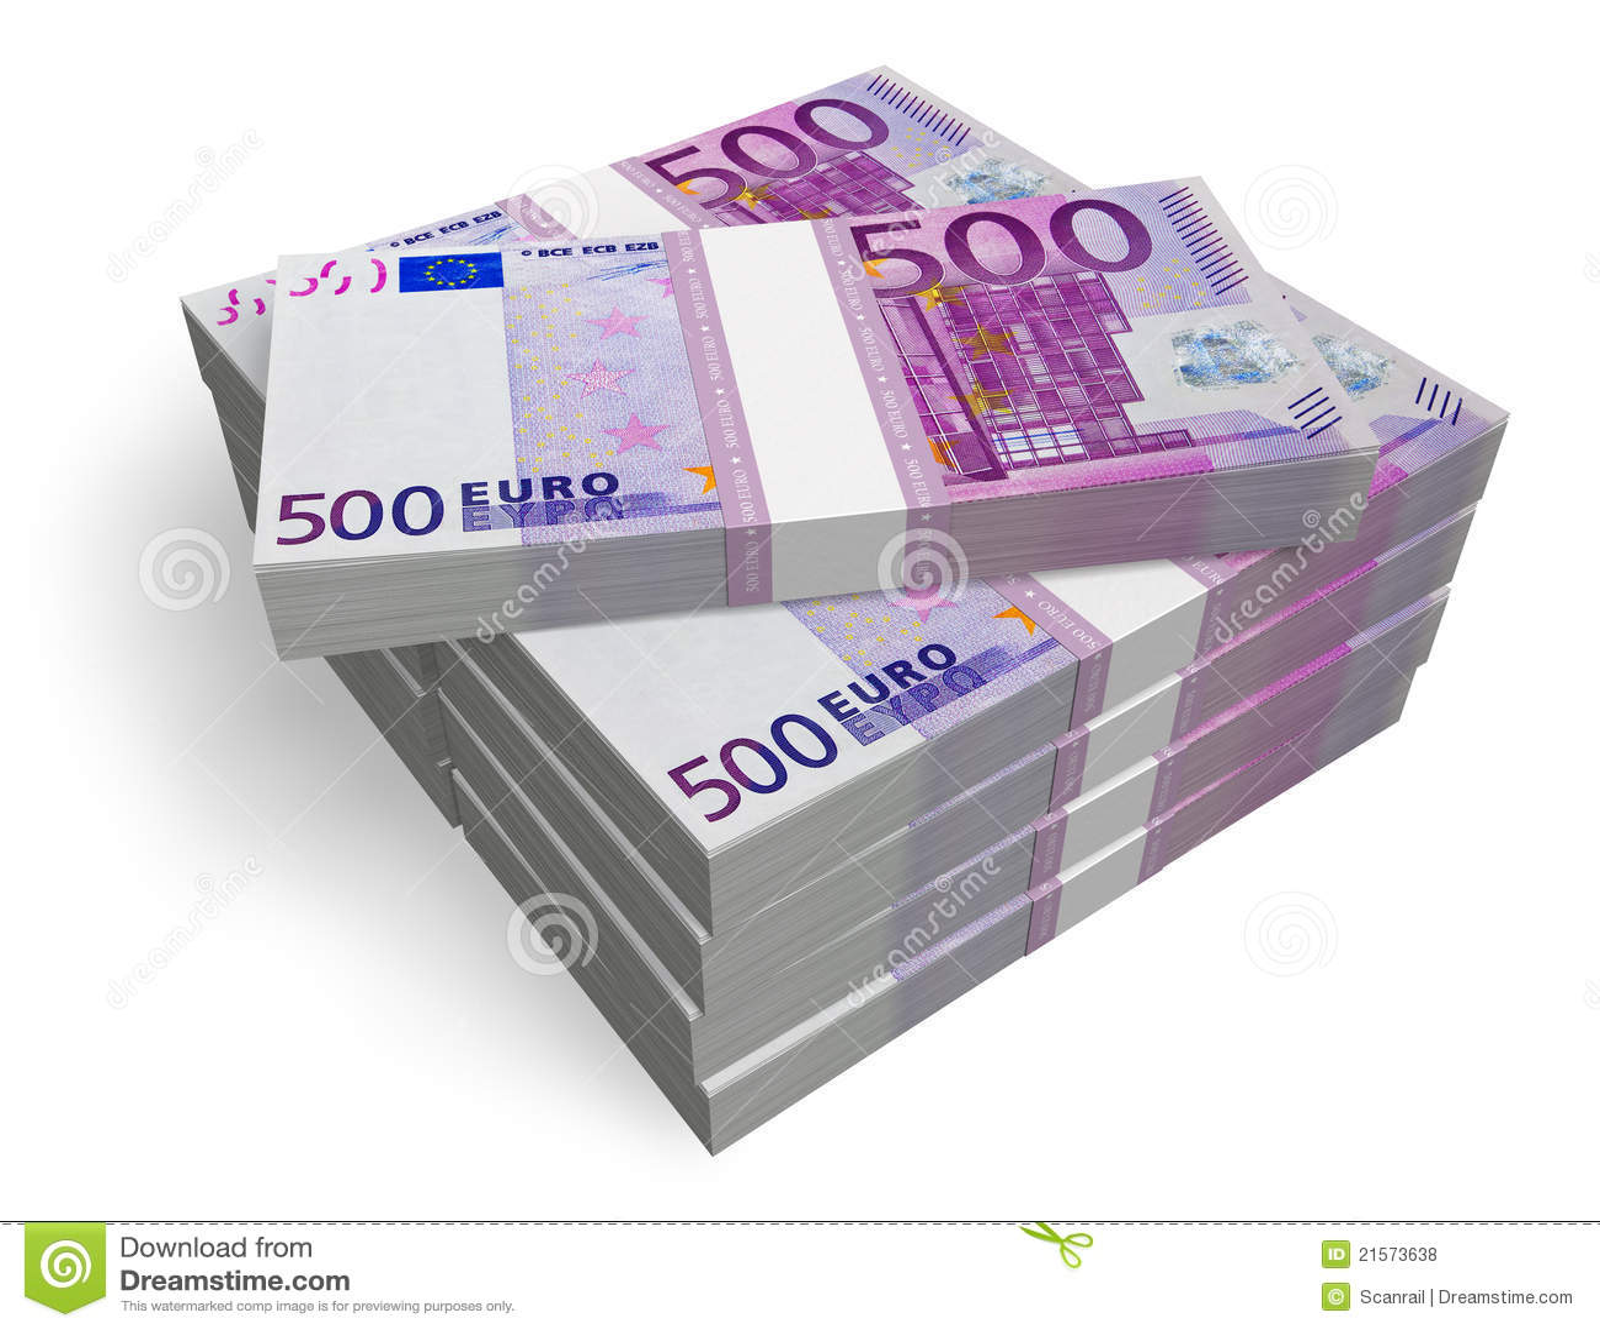 piles de 500 euro billets de banque photos libres de droits image 21573638. Black Bedroom Furniture Sets. Home Design Ideas